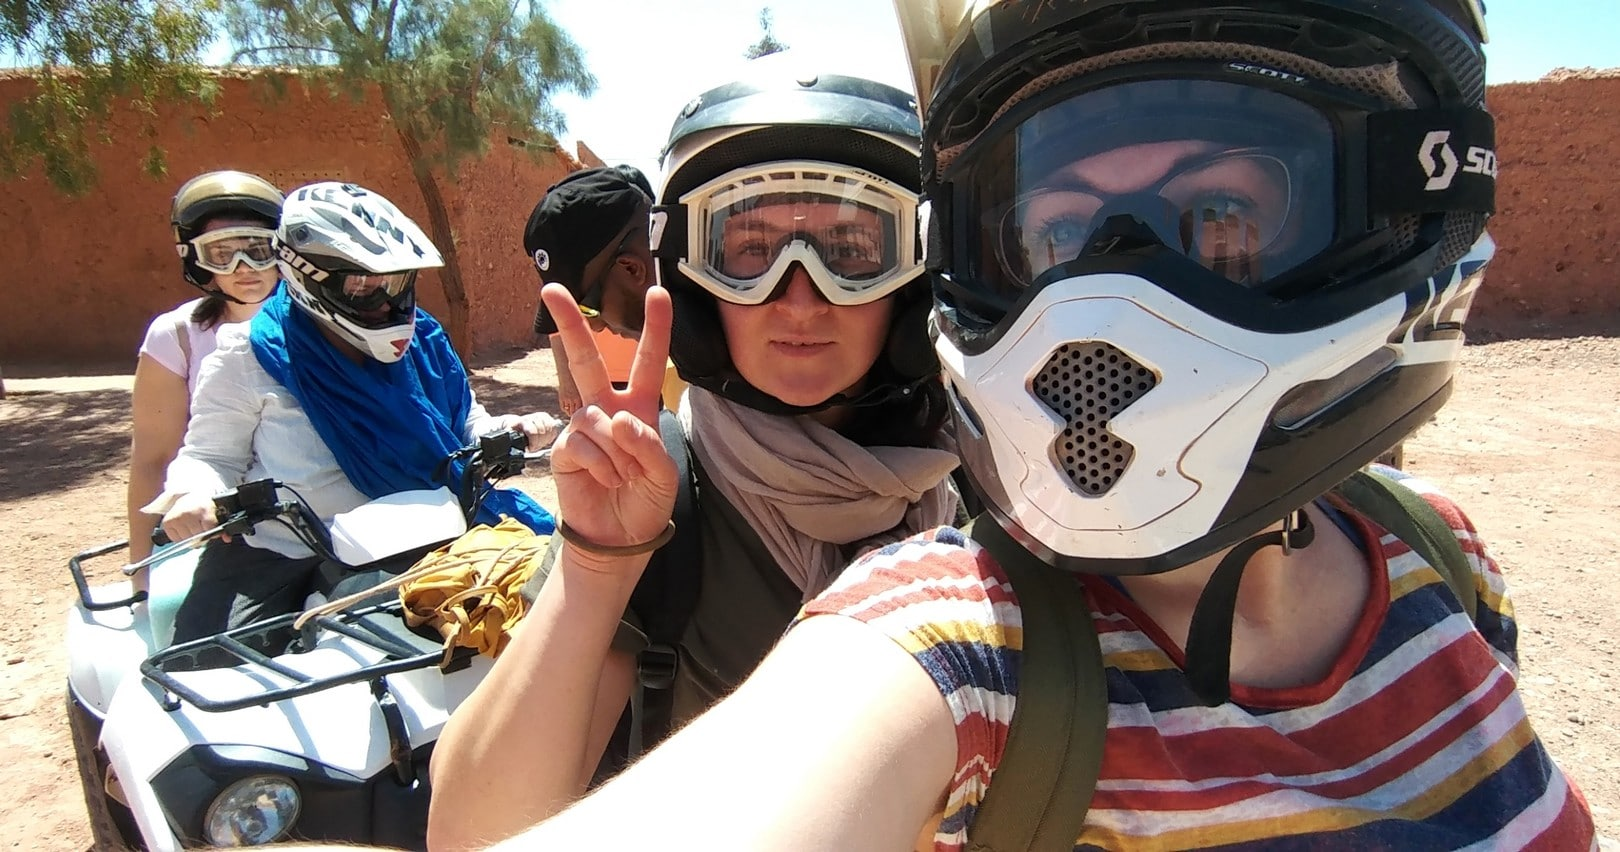 Maroc - Balade en quad entre Ait Ben Haddou et Ouarzazate